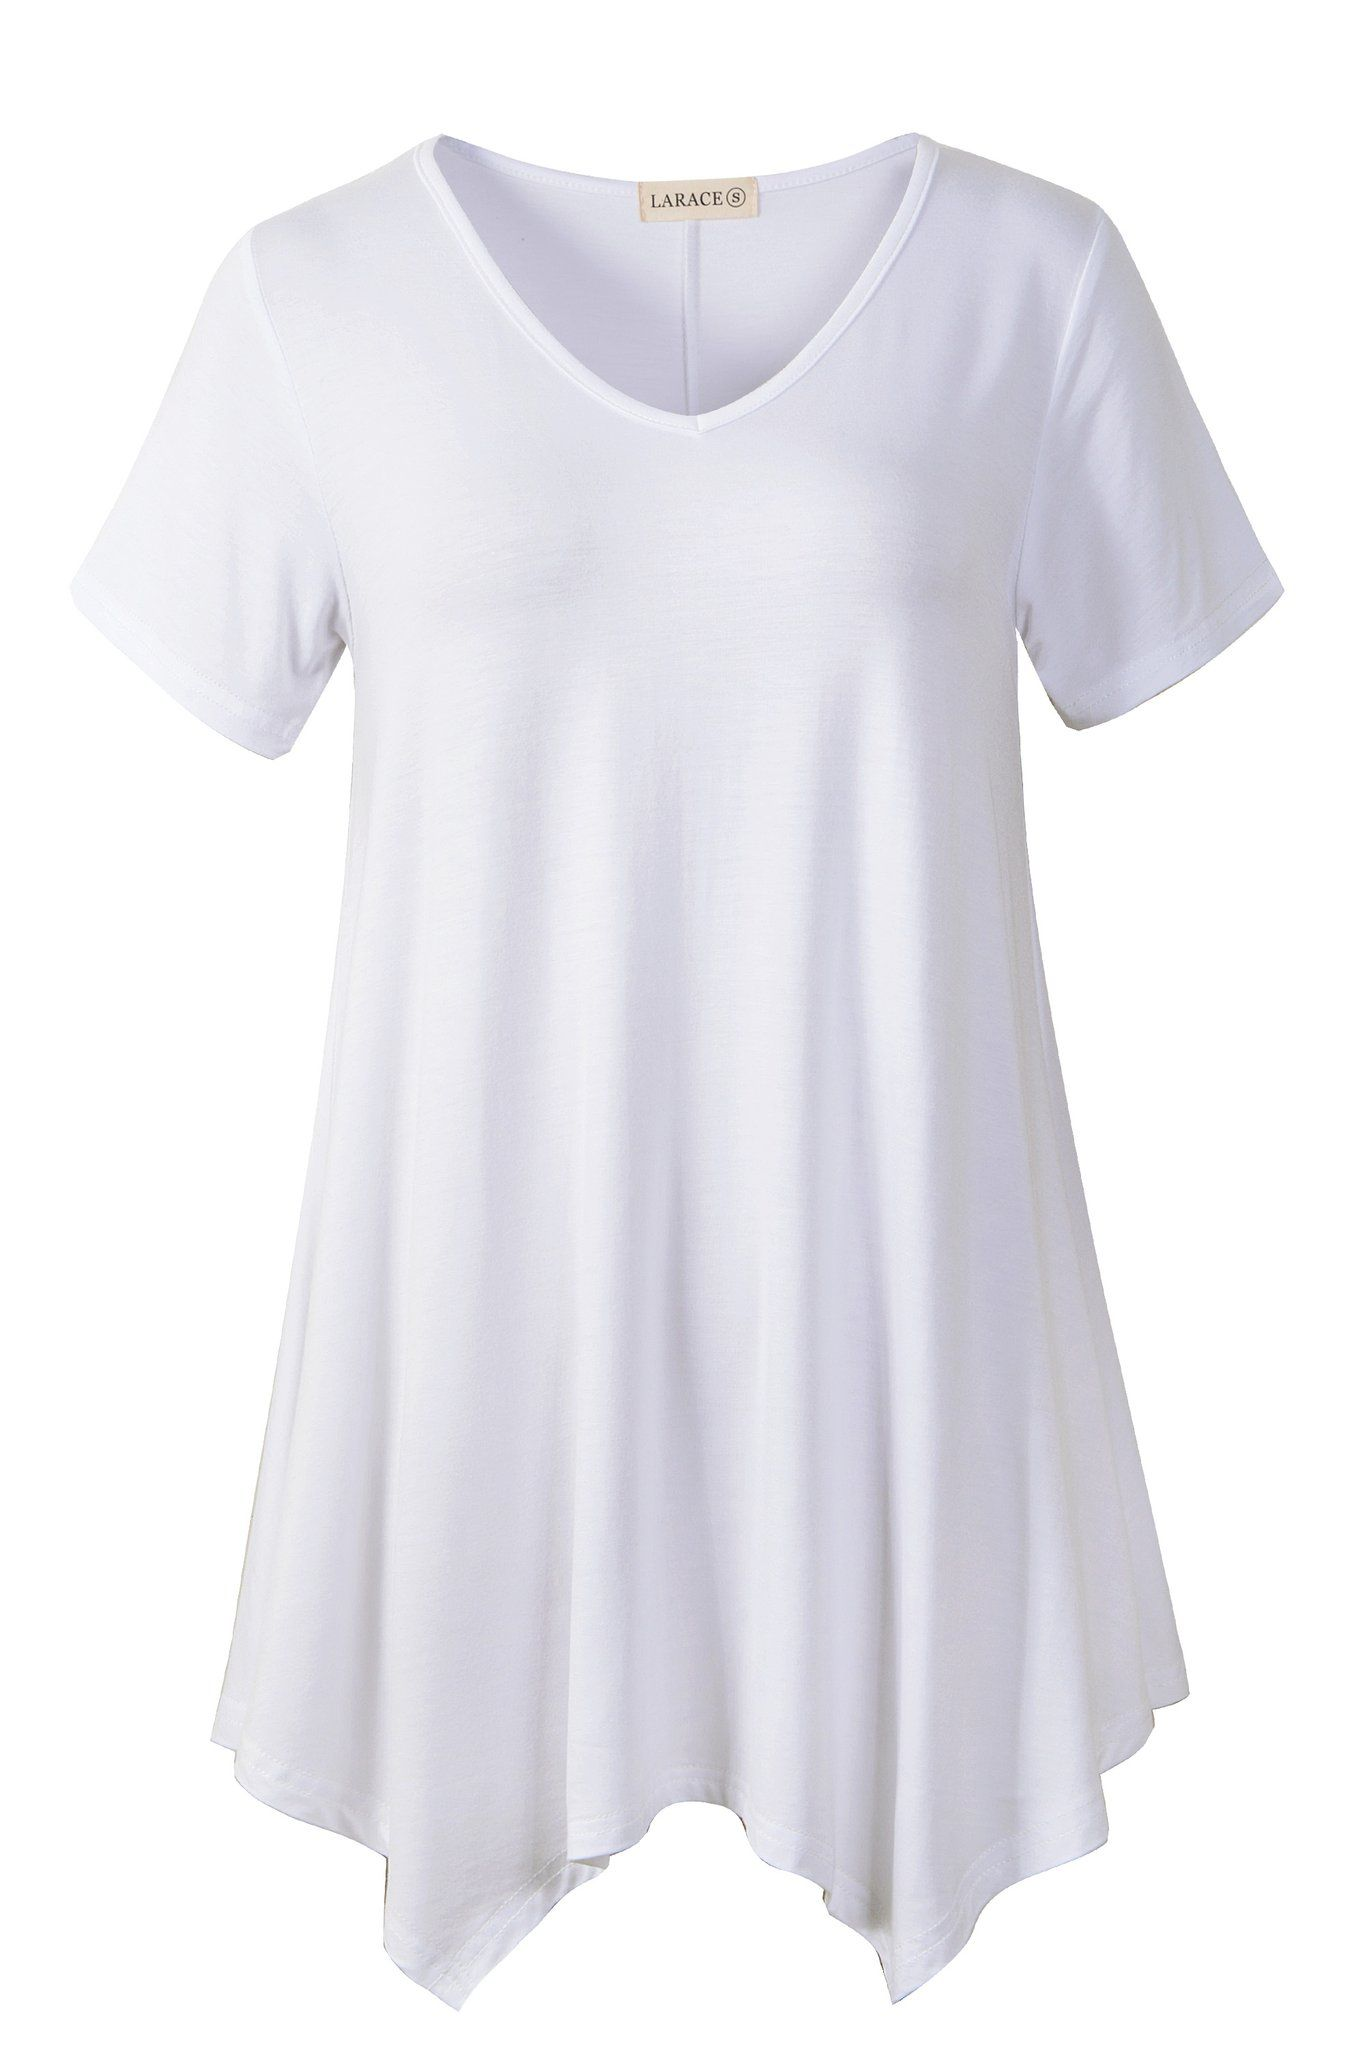 06fa9db6 Casual T Shirt V-Neck Tunic Tops for Leggings | CHEAP WHOLESALE ...